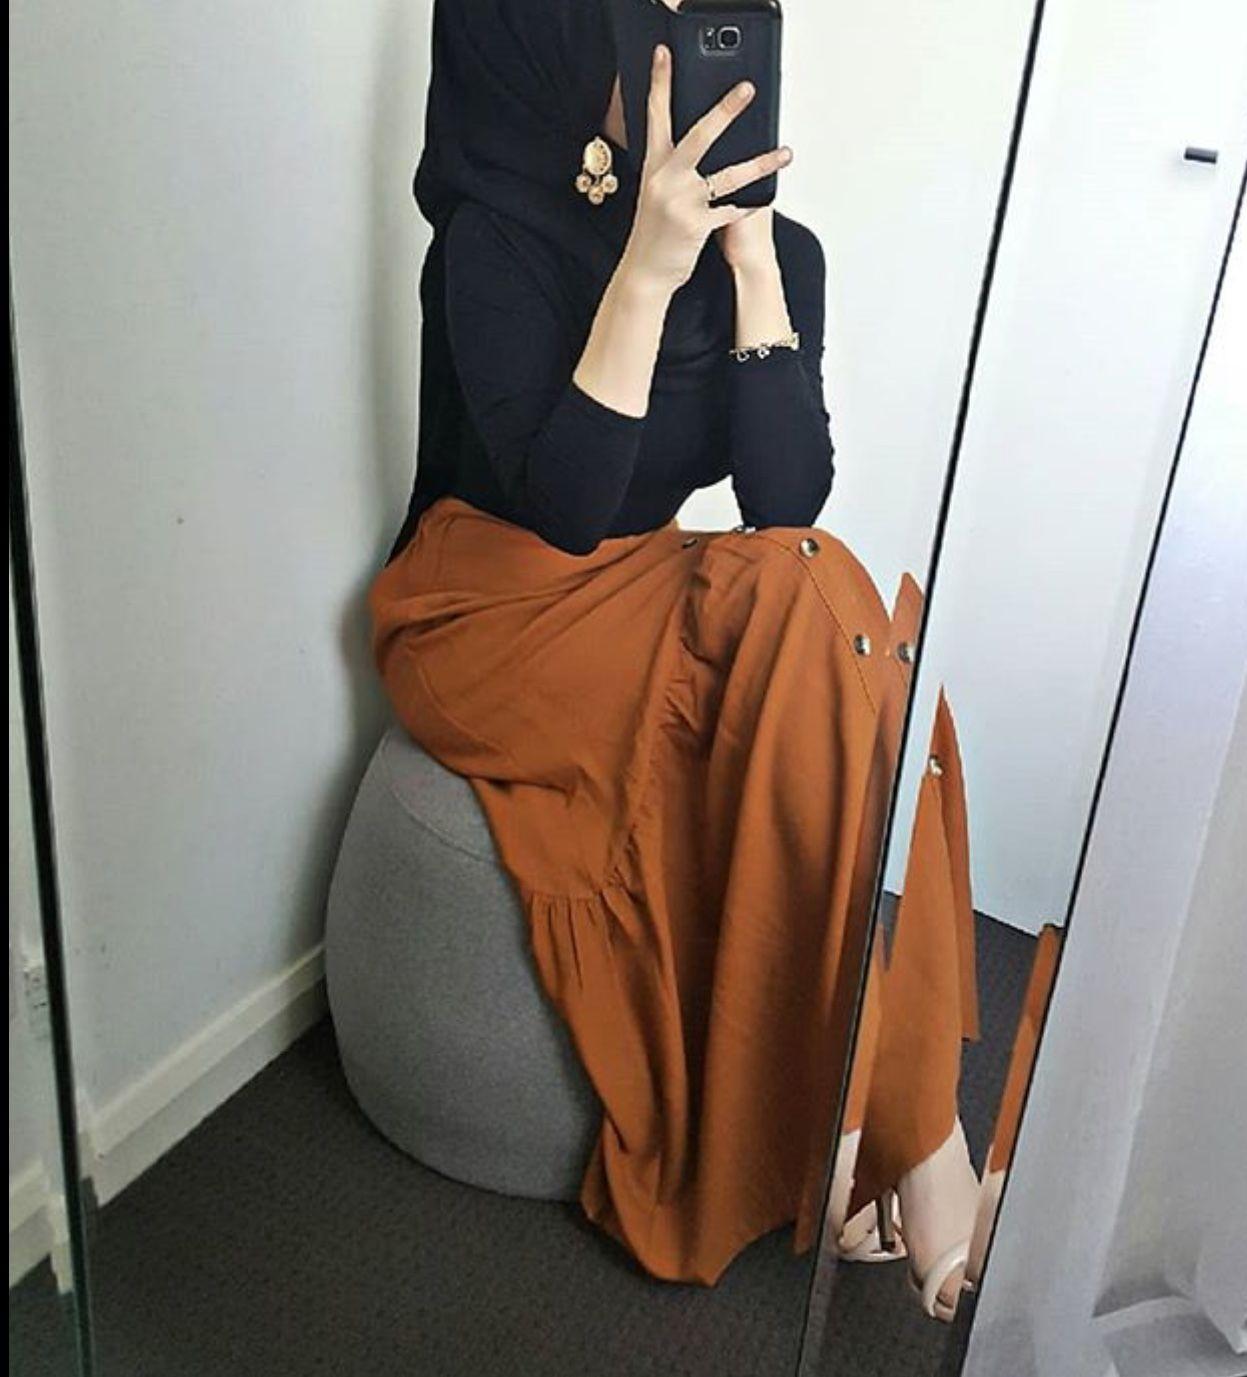 Pin By Sana:) On Hijabi !!!!! Style